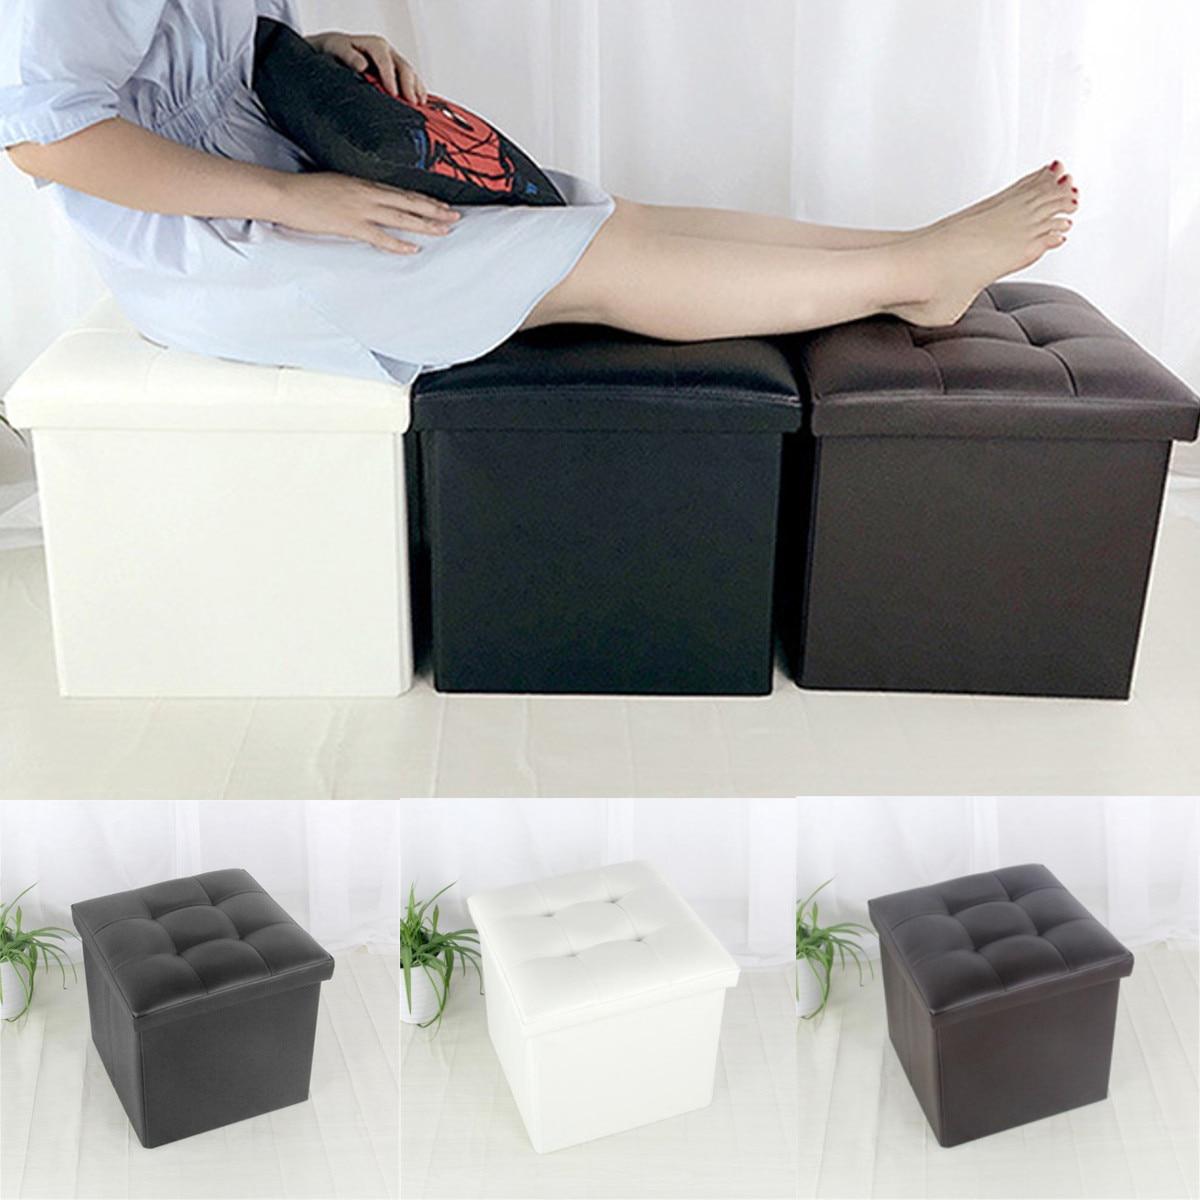 Leather Footstool Sofa Ottoman Folding Footrest Seat Lounge Simple  Imitation Leather Footstool Home Room Storage Box Chair